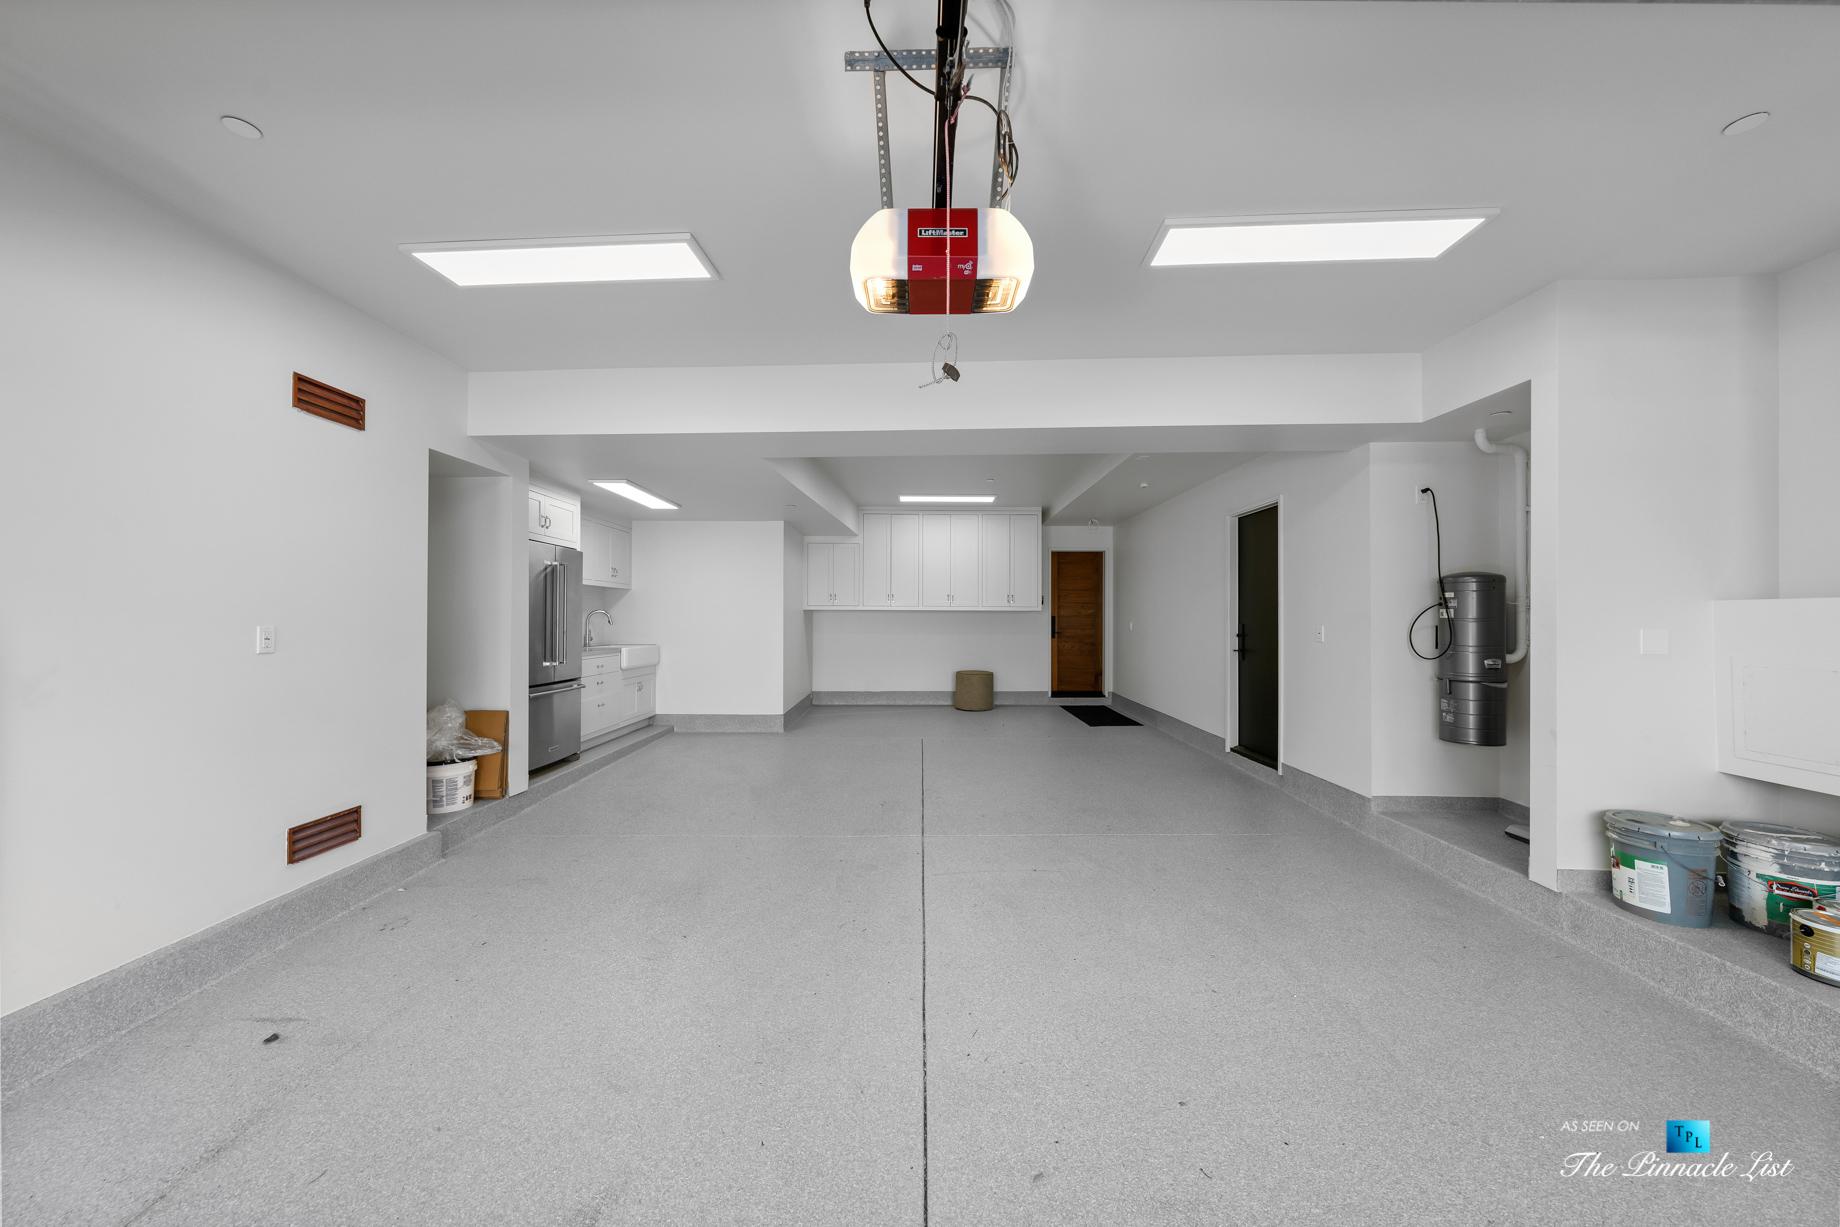 508 The Strand, Manhattan Beach, CA, USA - Lower Level Garage with Kitchen - Luxury Real Estate - Oceanfront Home